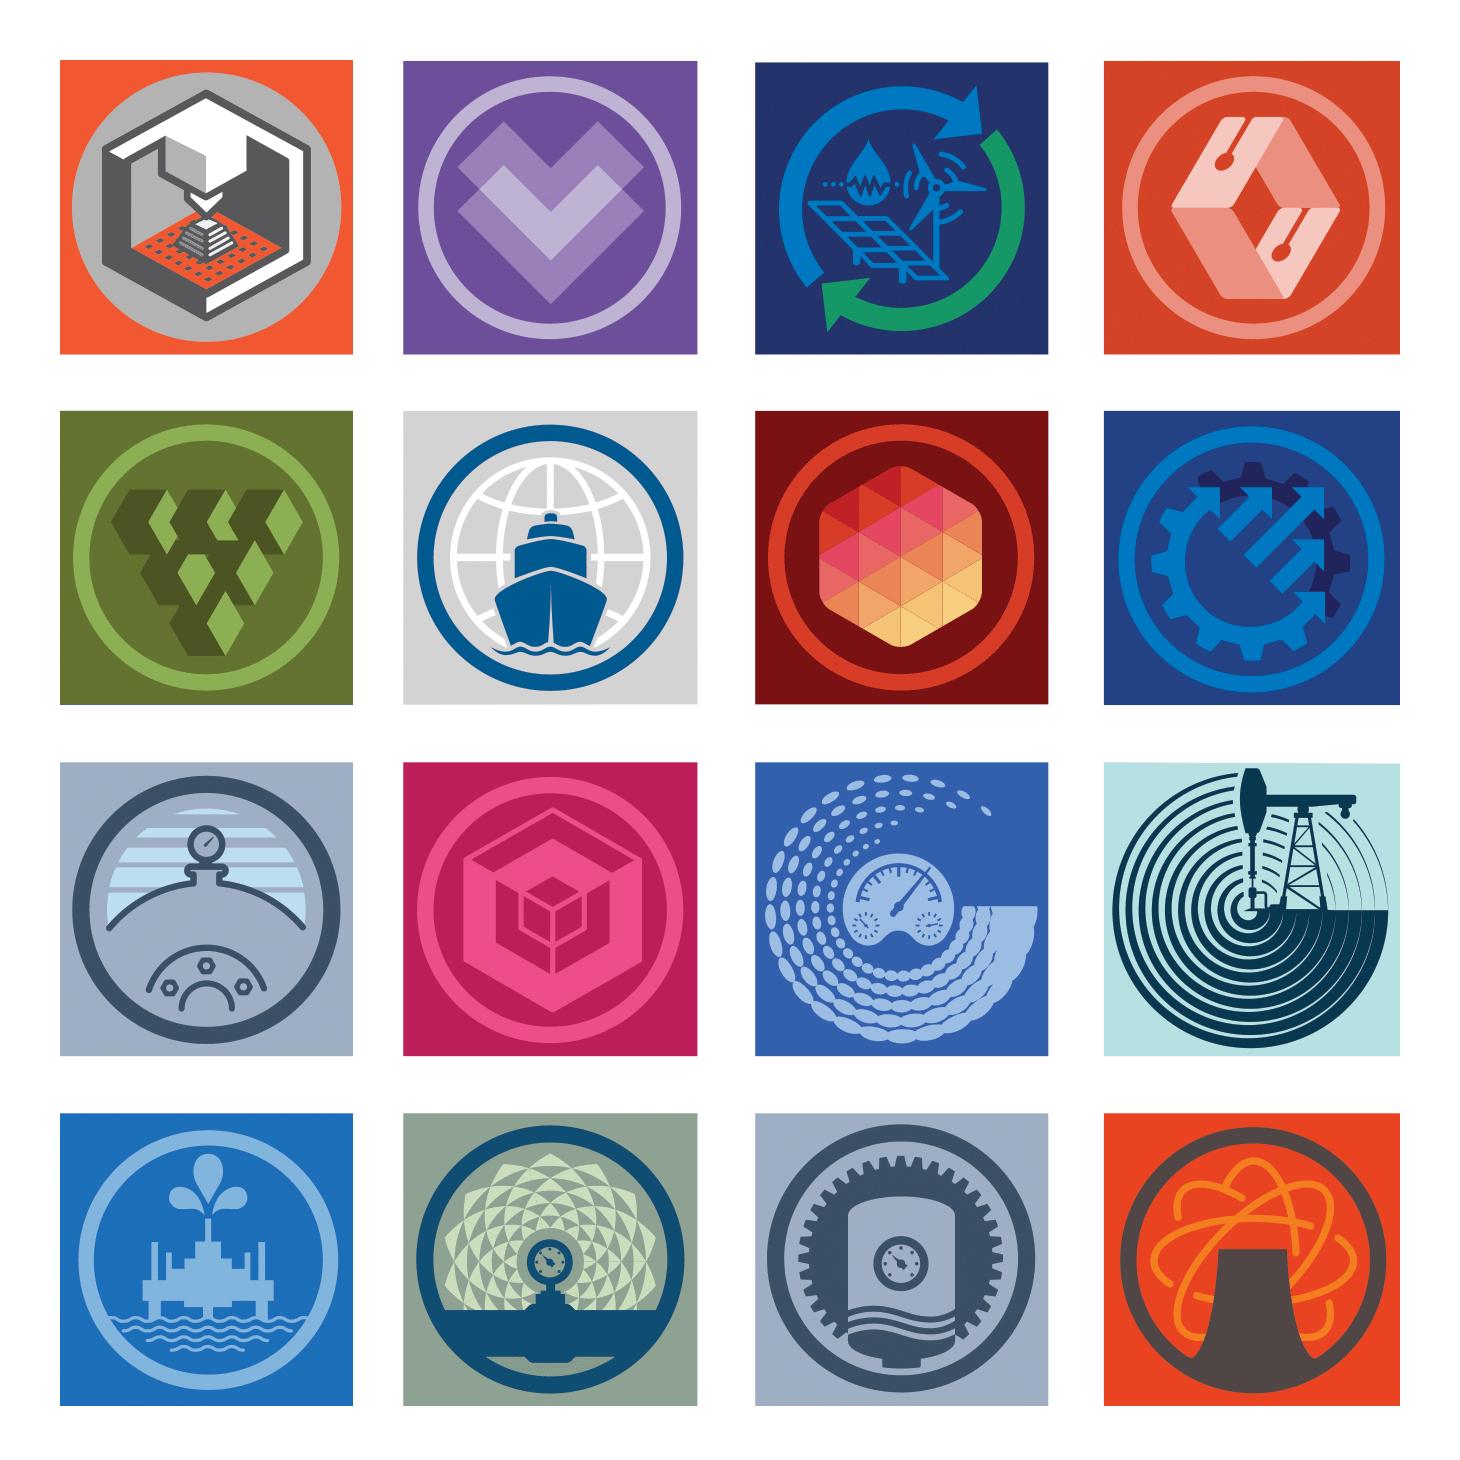 ASME Conference logos